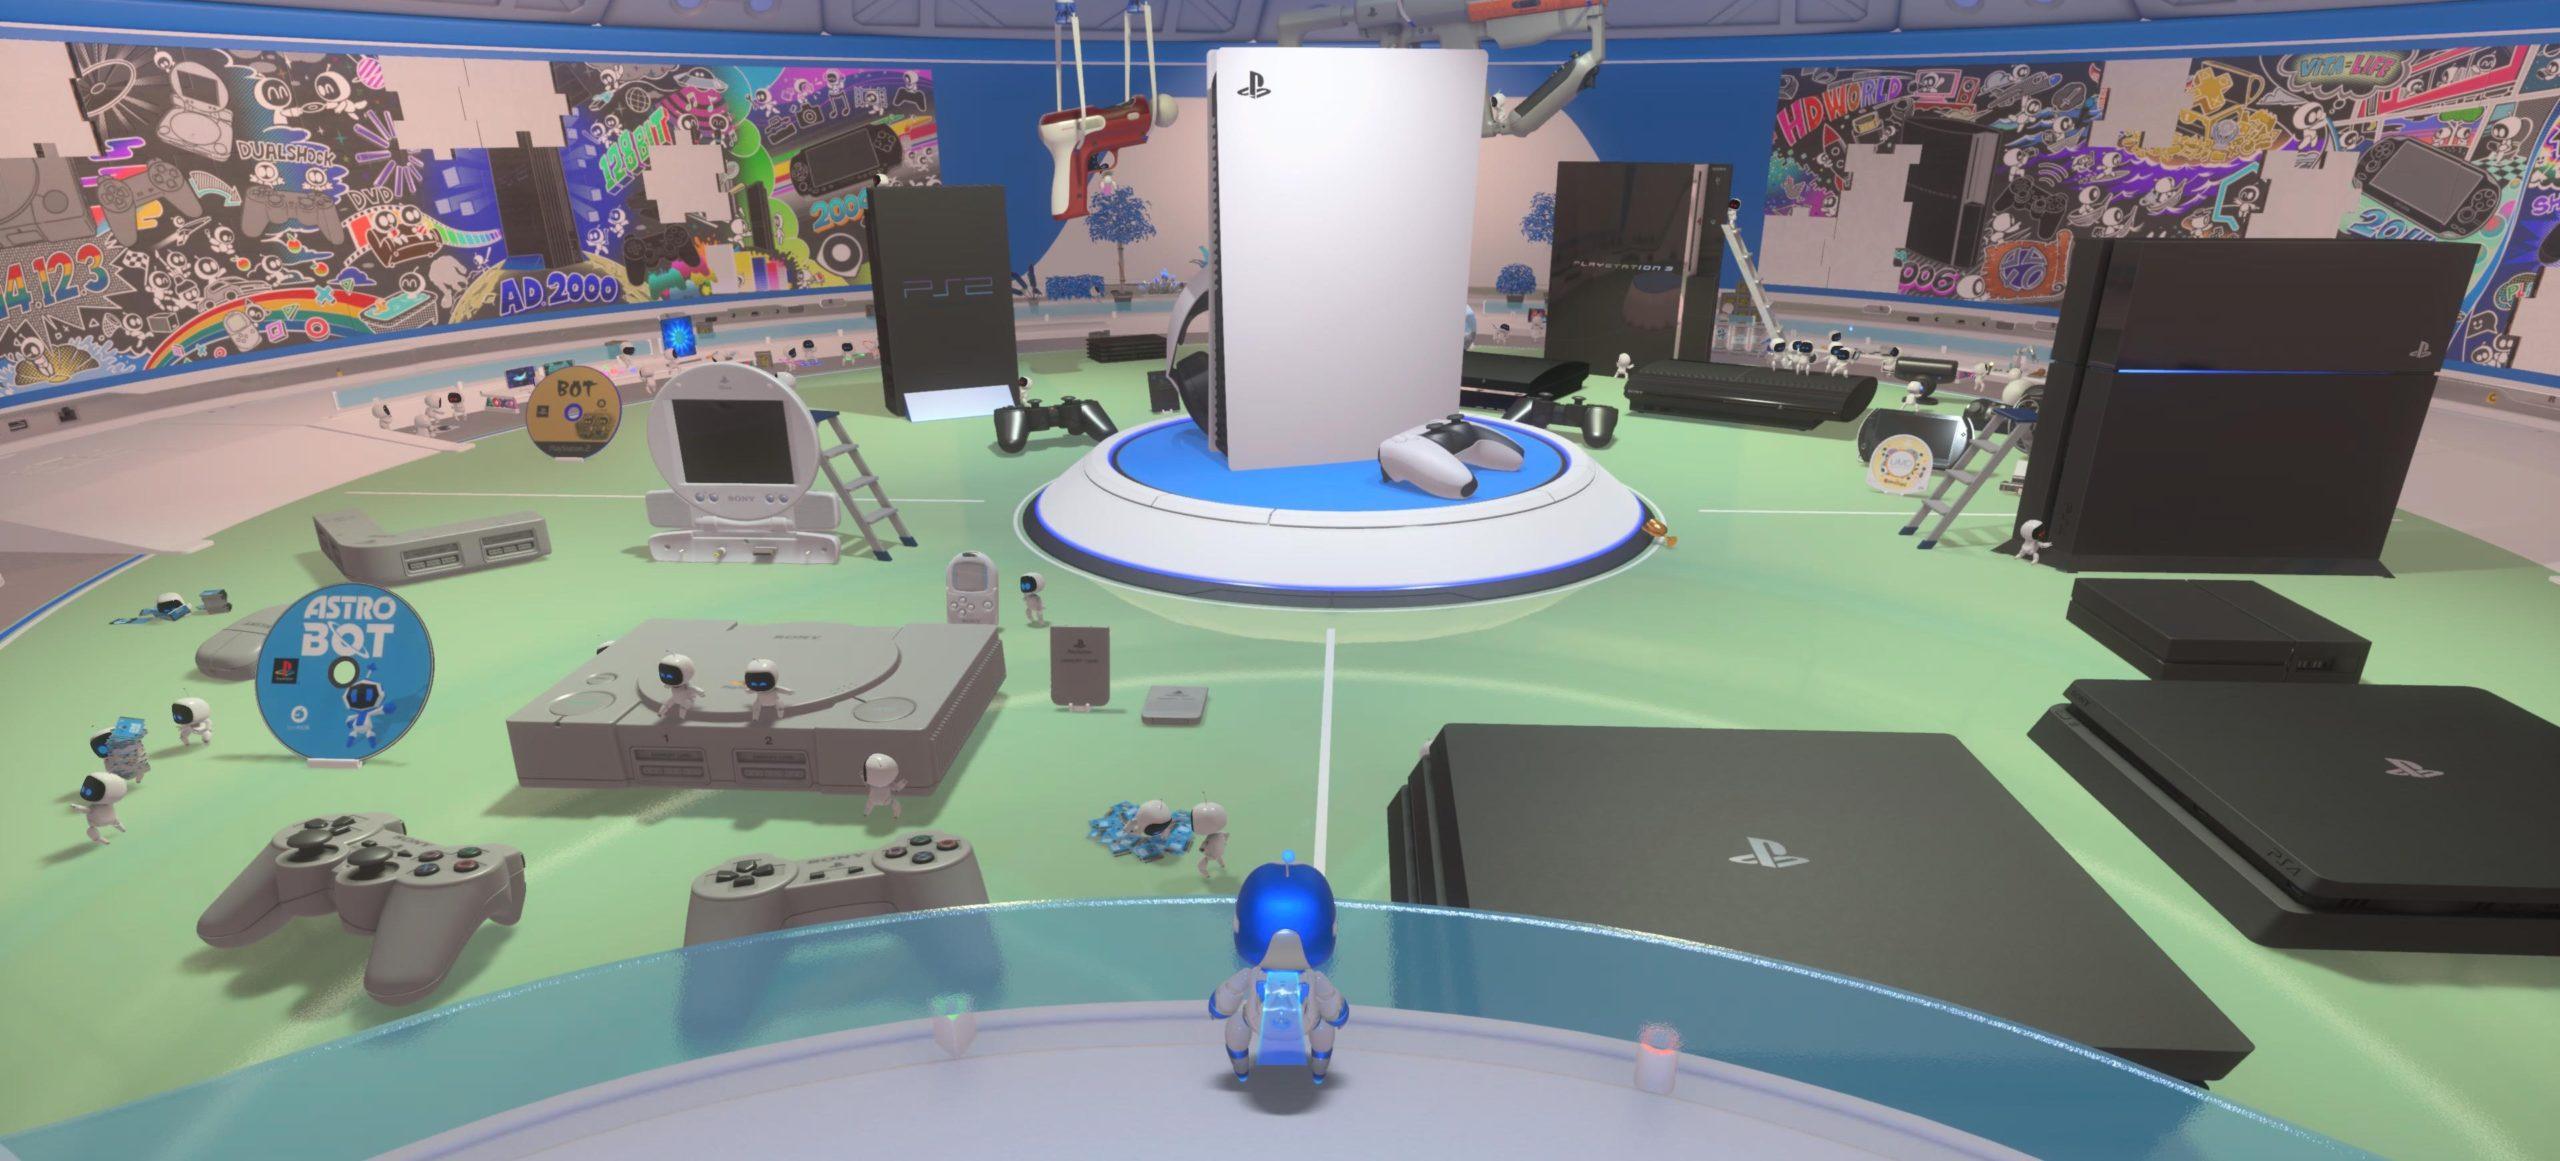 astros playroom para ps5